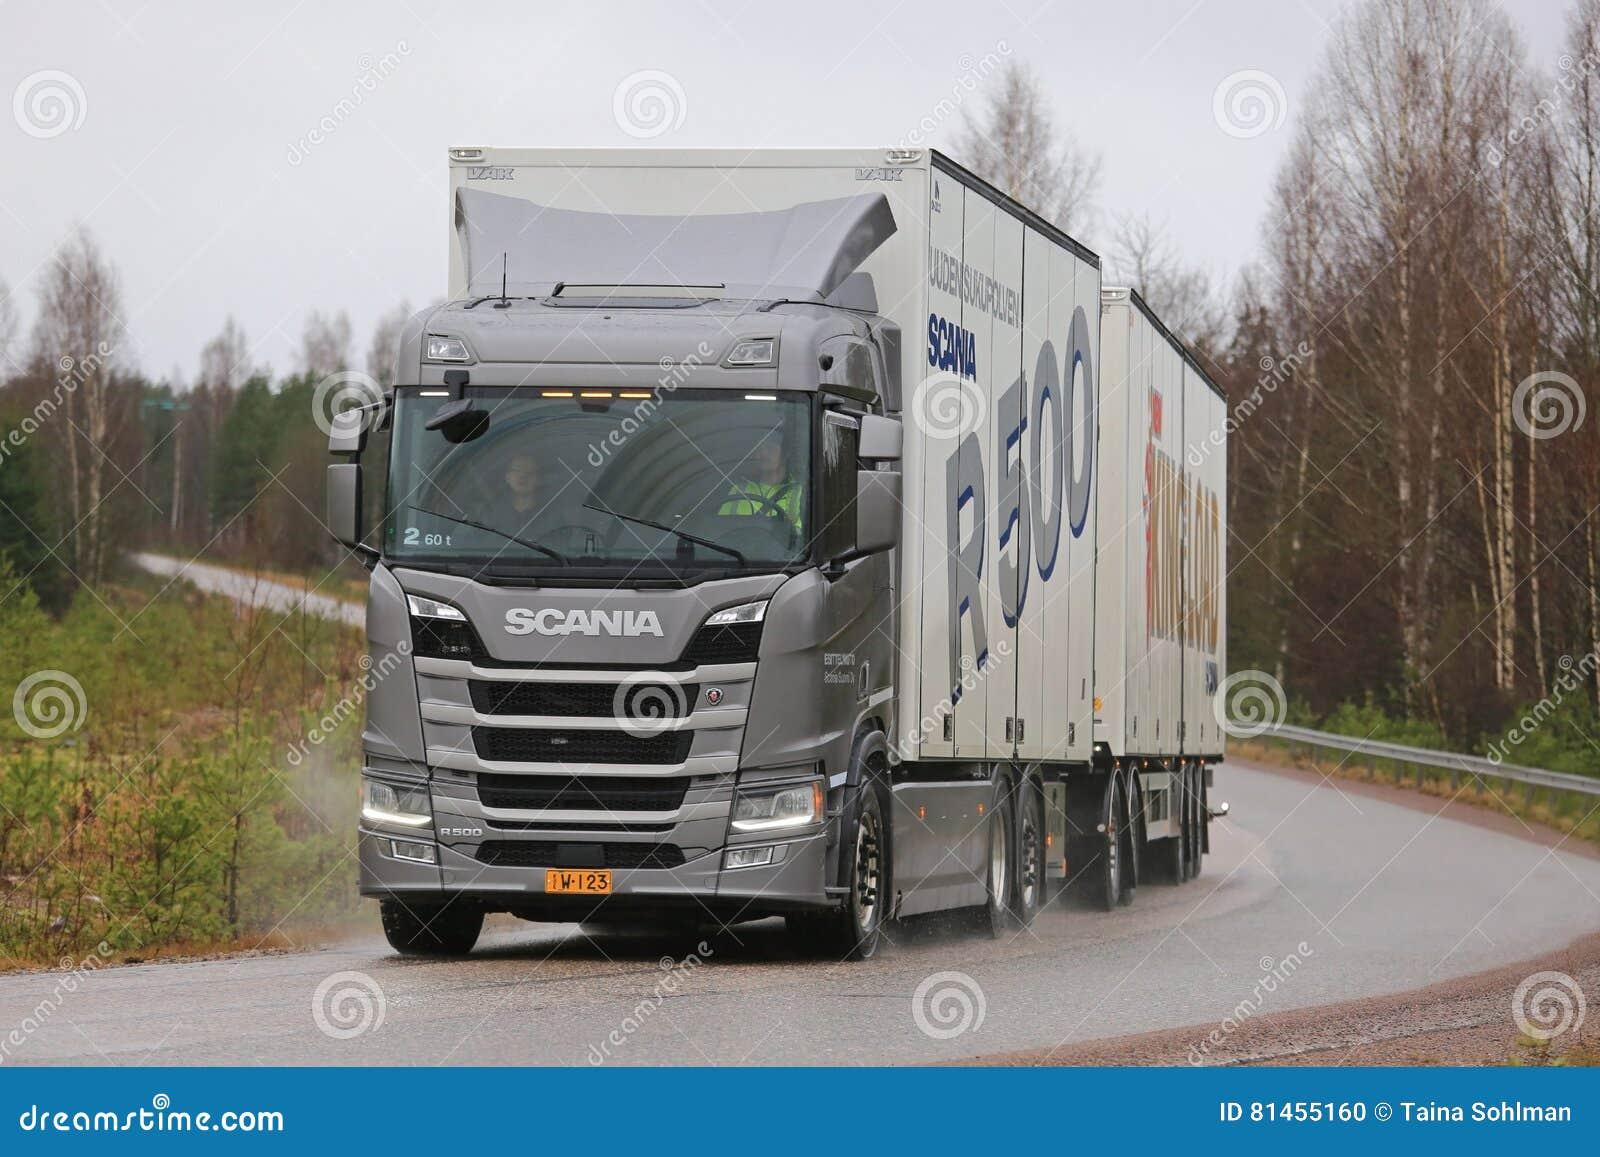 new next generation scania r500 trailer truck on test. Black Bedroom Furniture Sets. Home Design Ideas